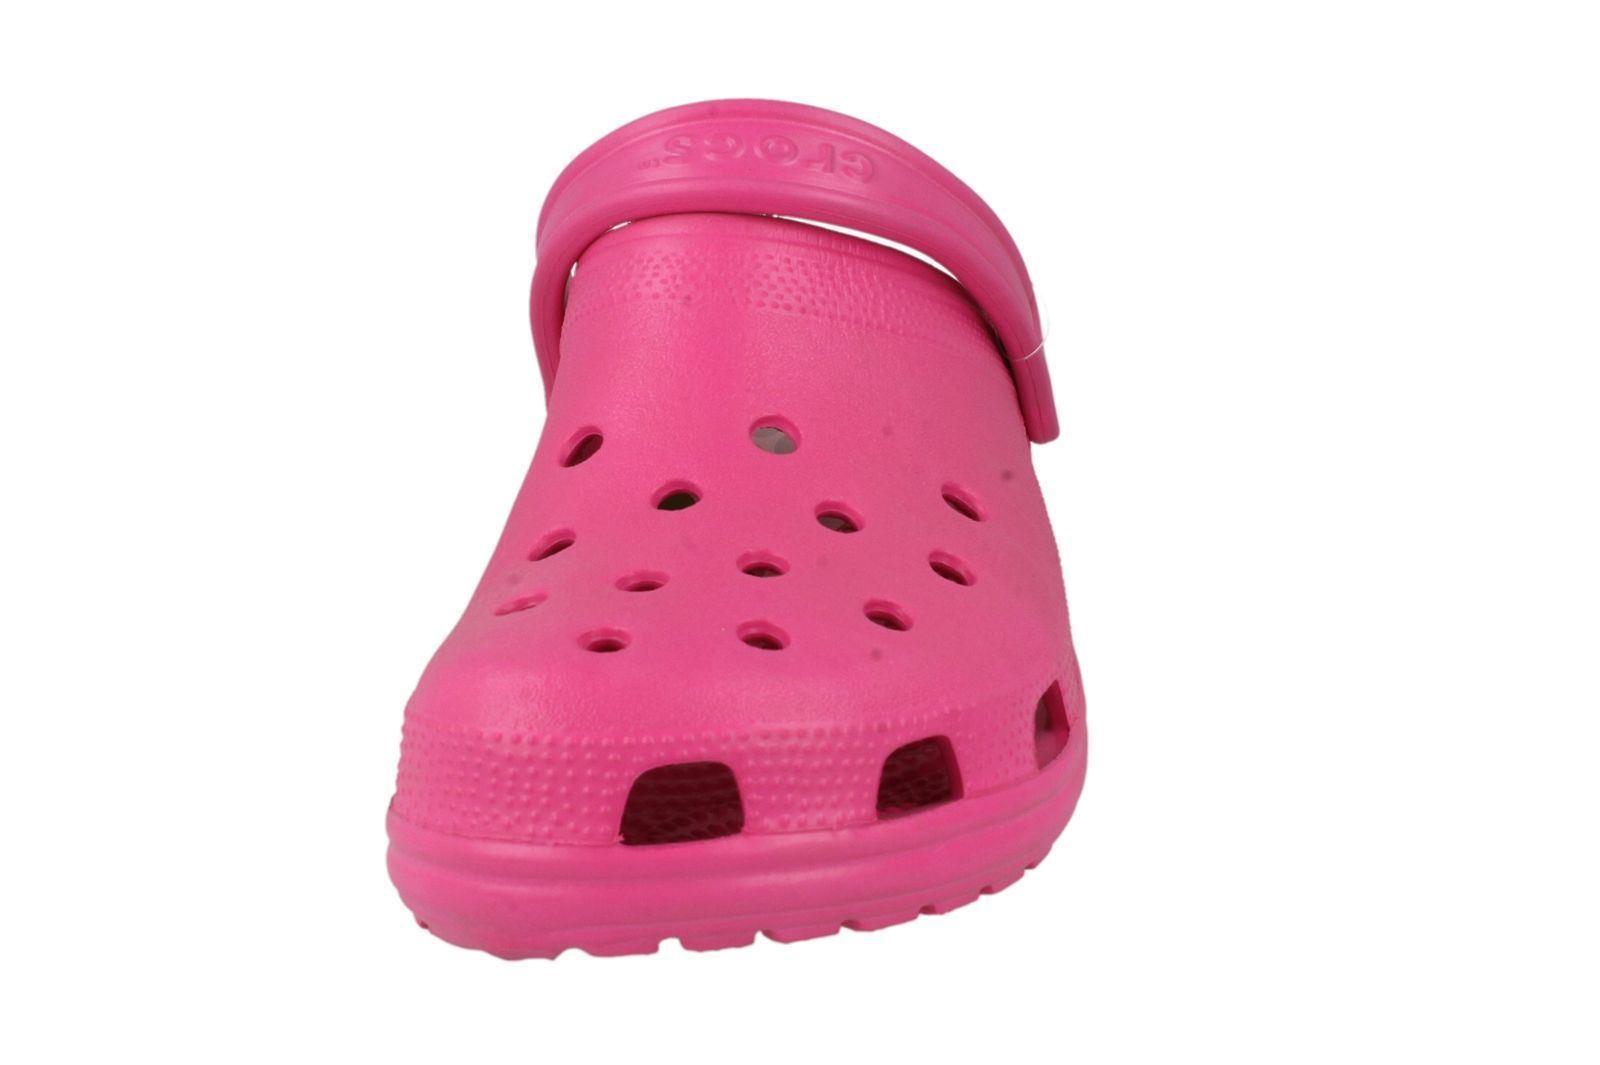 bb84efd0a2e17e Adults Crocs Slingback Rubber Clogs  Cayman  The Style ~ K